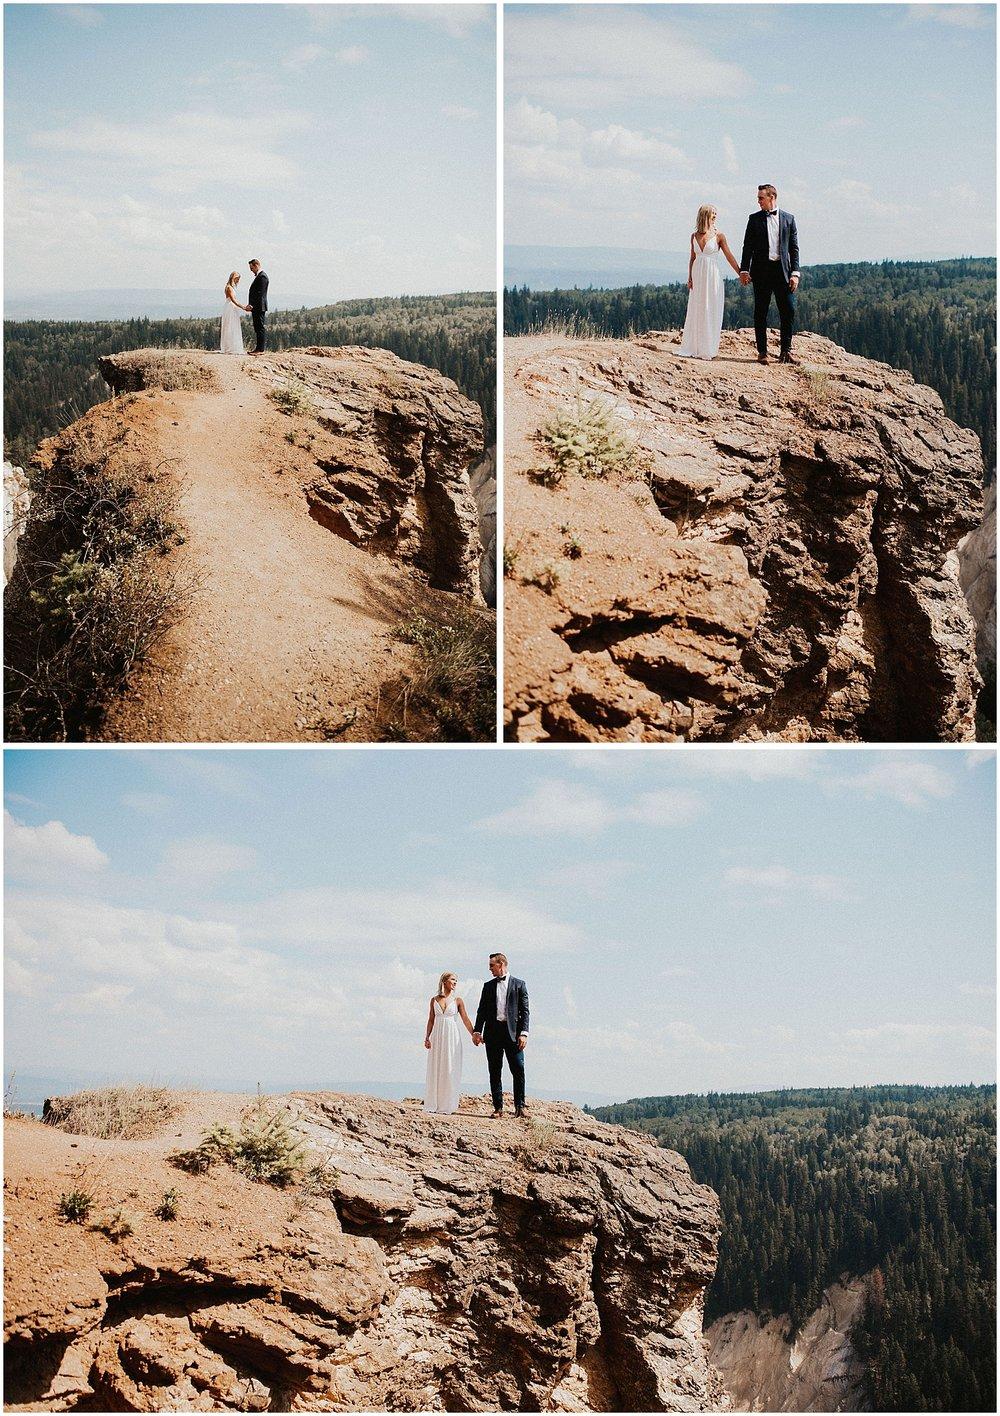 Quesnel_wedding_vancouver_bc_elopement_Pinnacles_Provincial_Park_0198.jpg